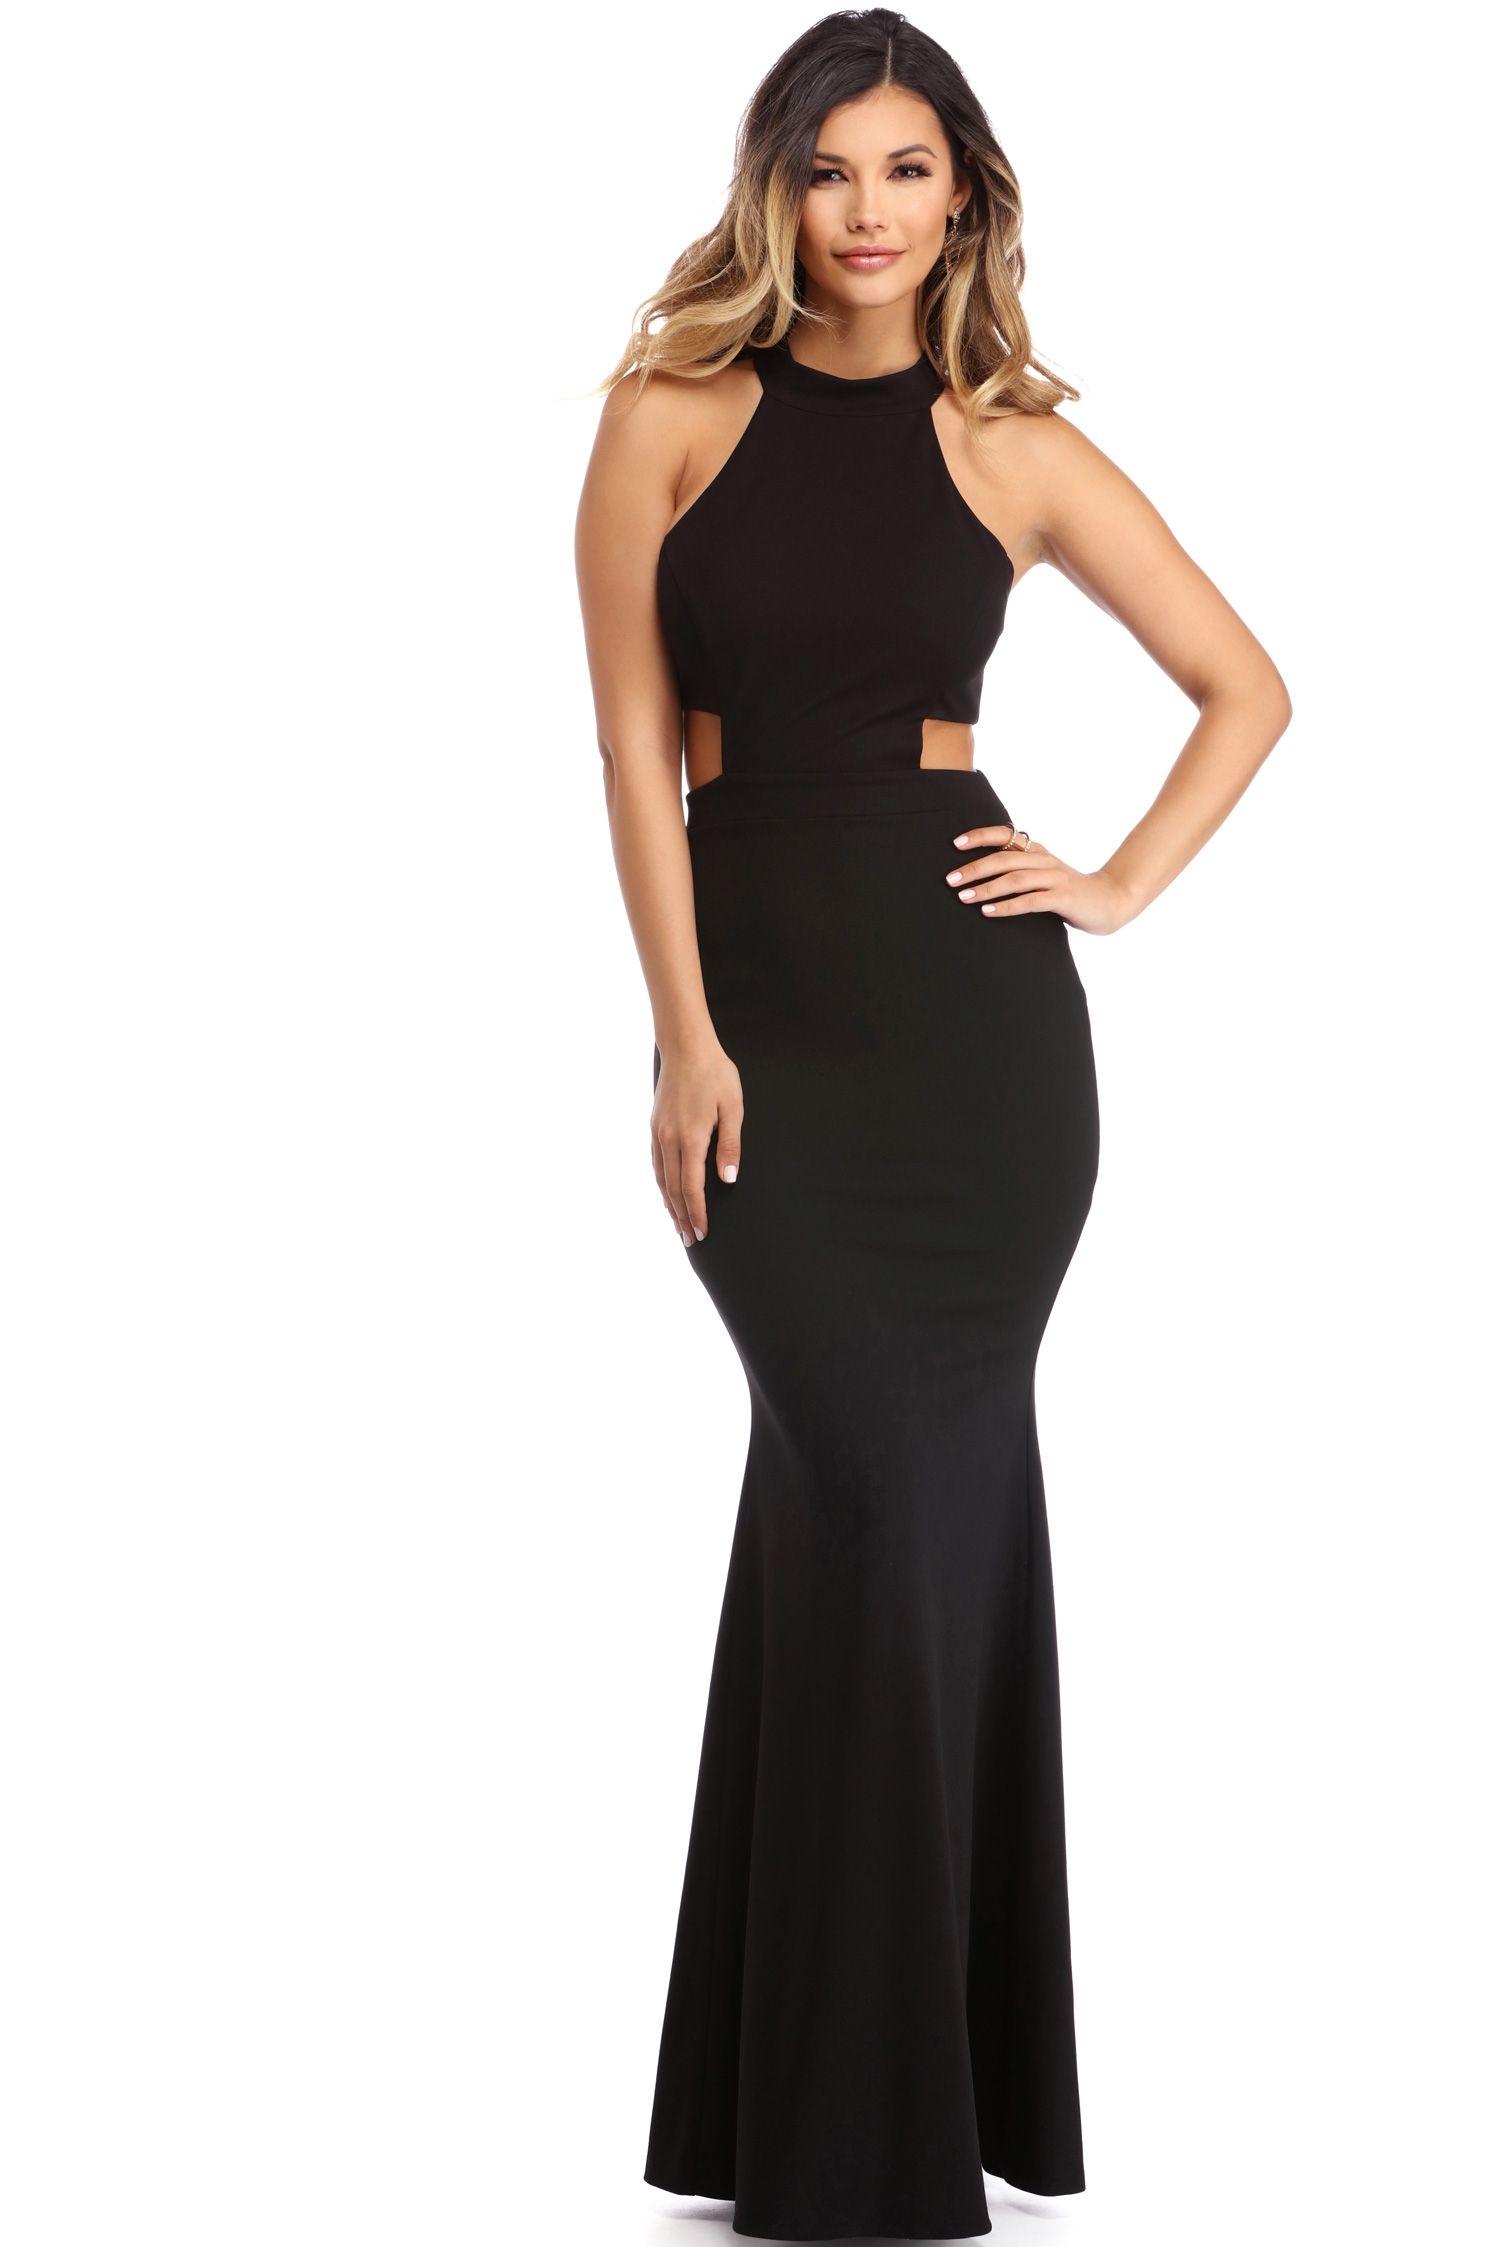 Monica black back detail dress black products and windsor